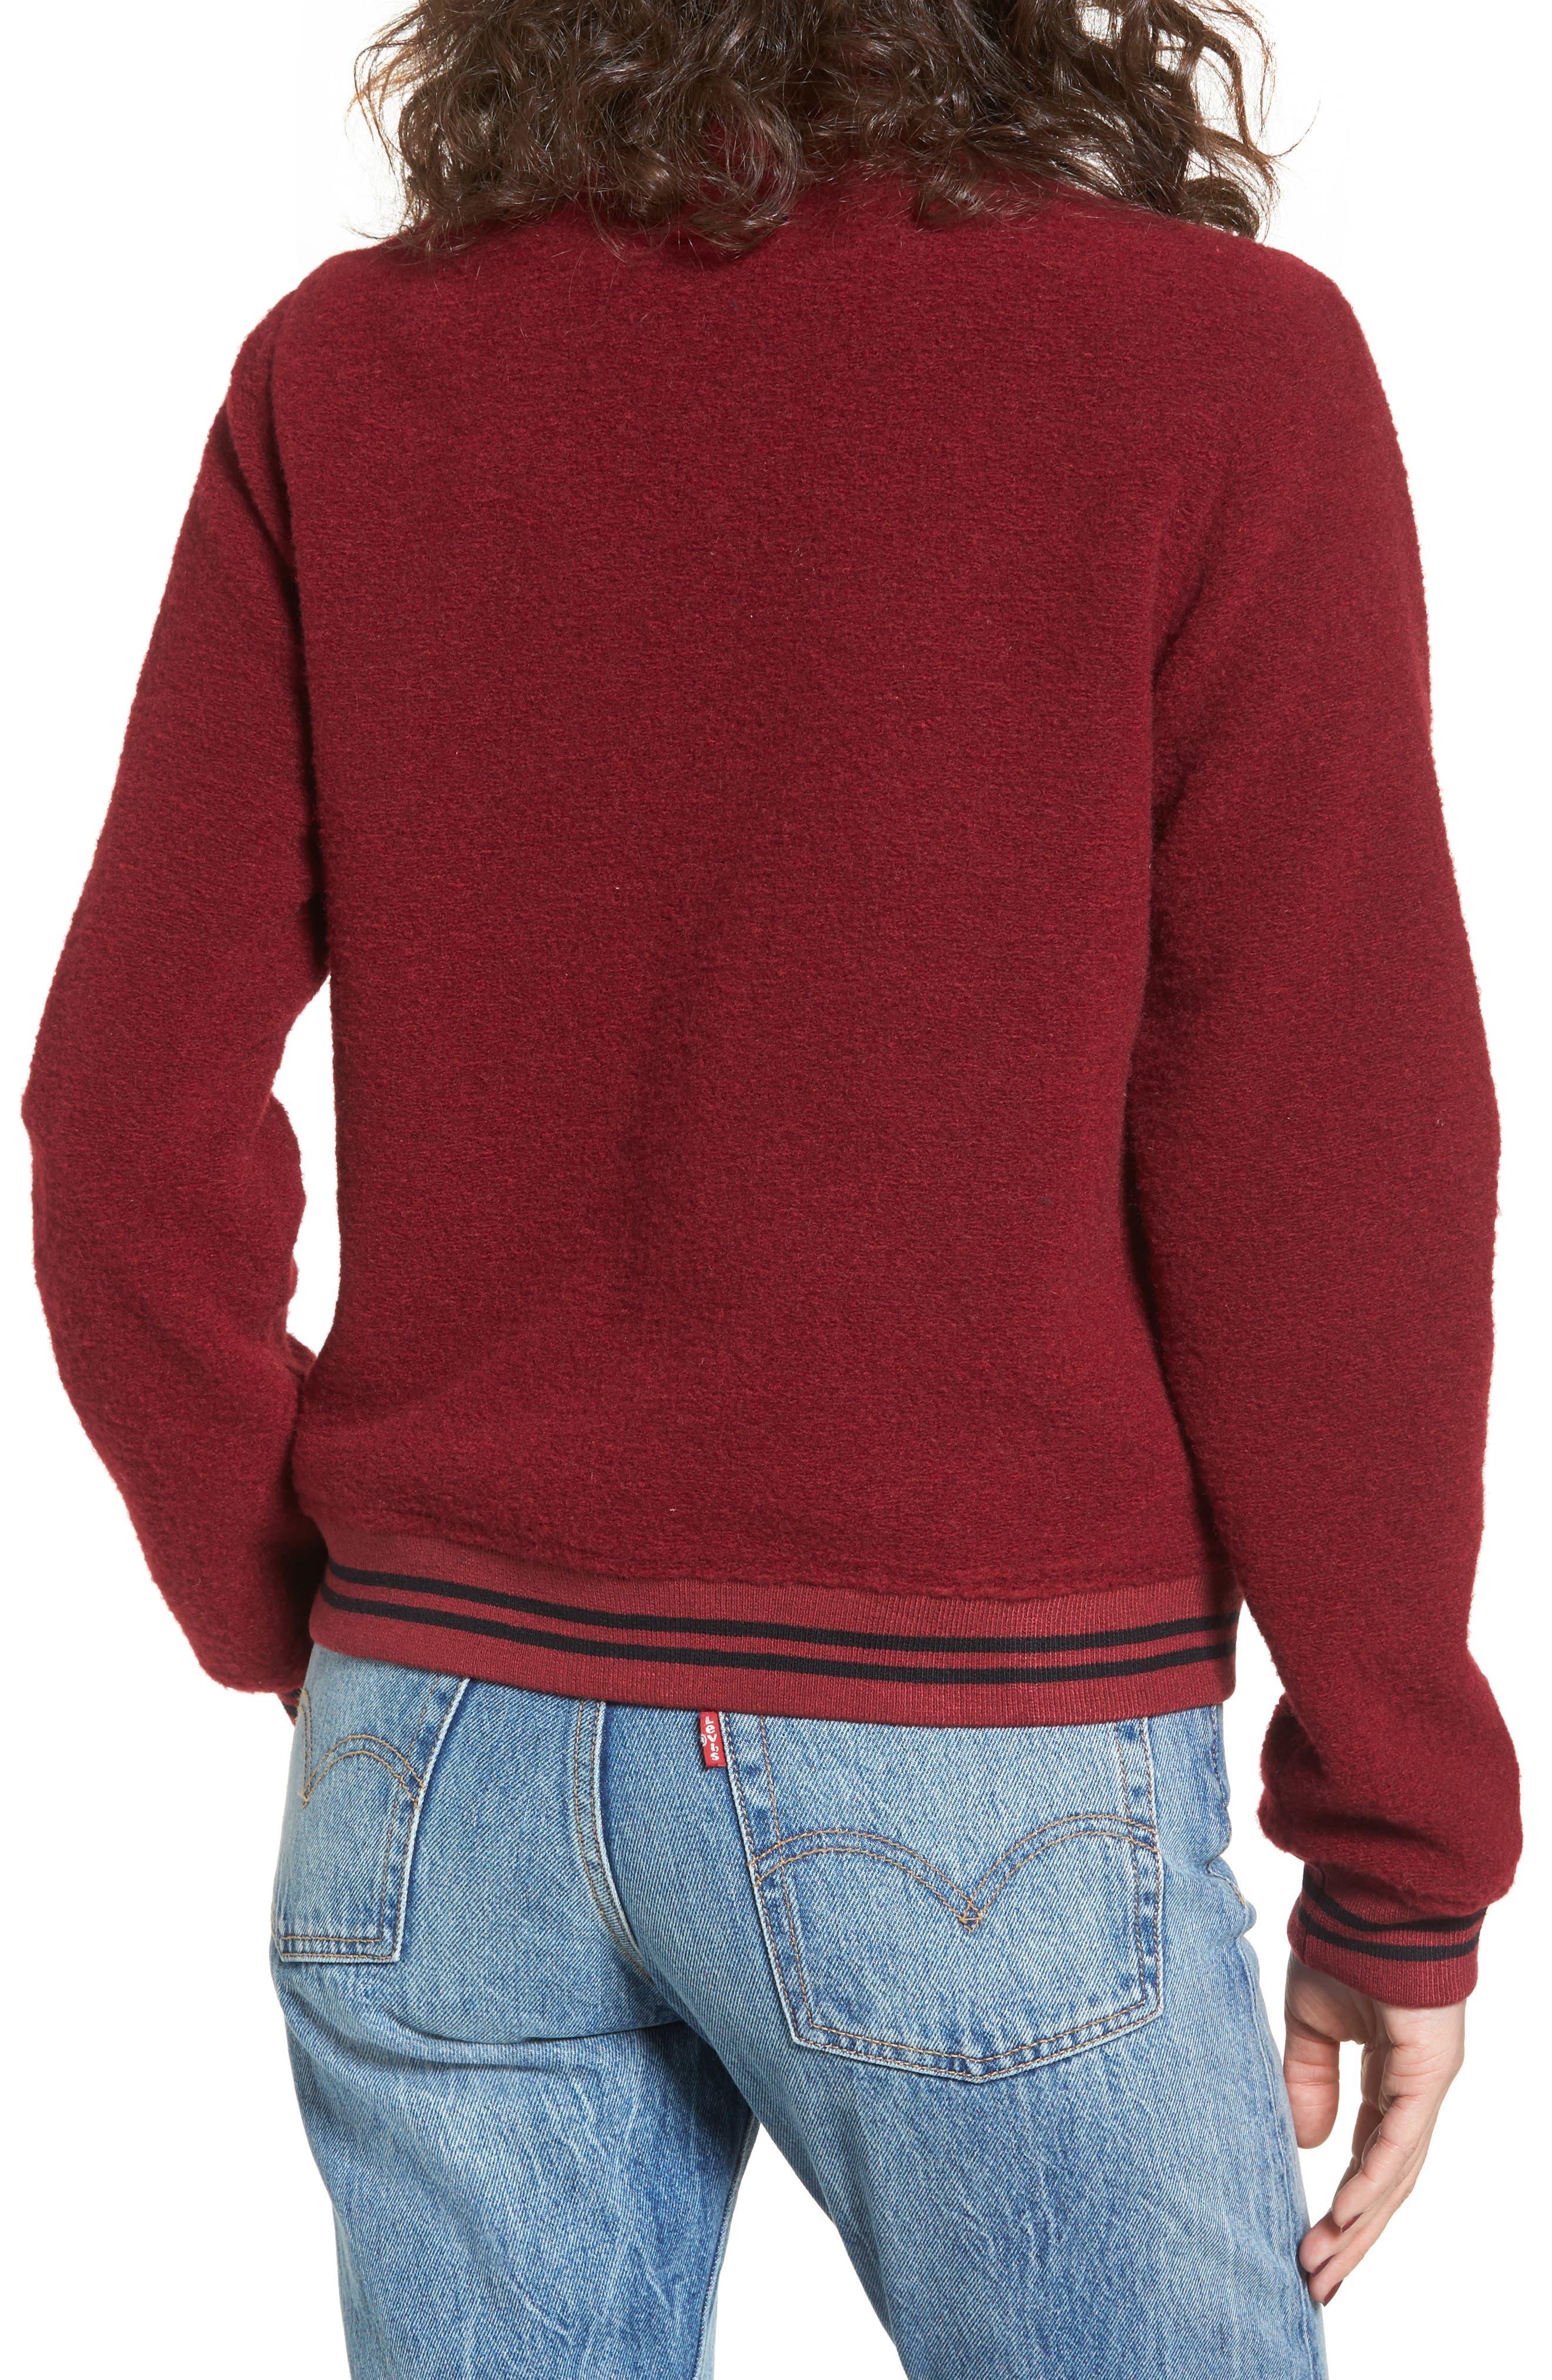 Cambridge Jacket,                             Alternate thumbnail 2, color,                             930